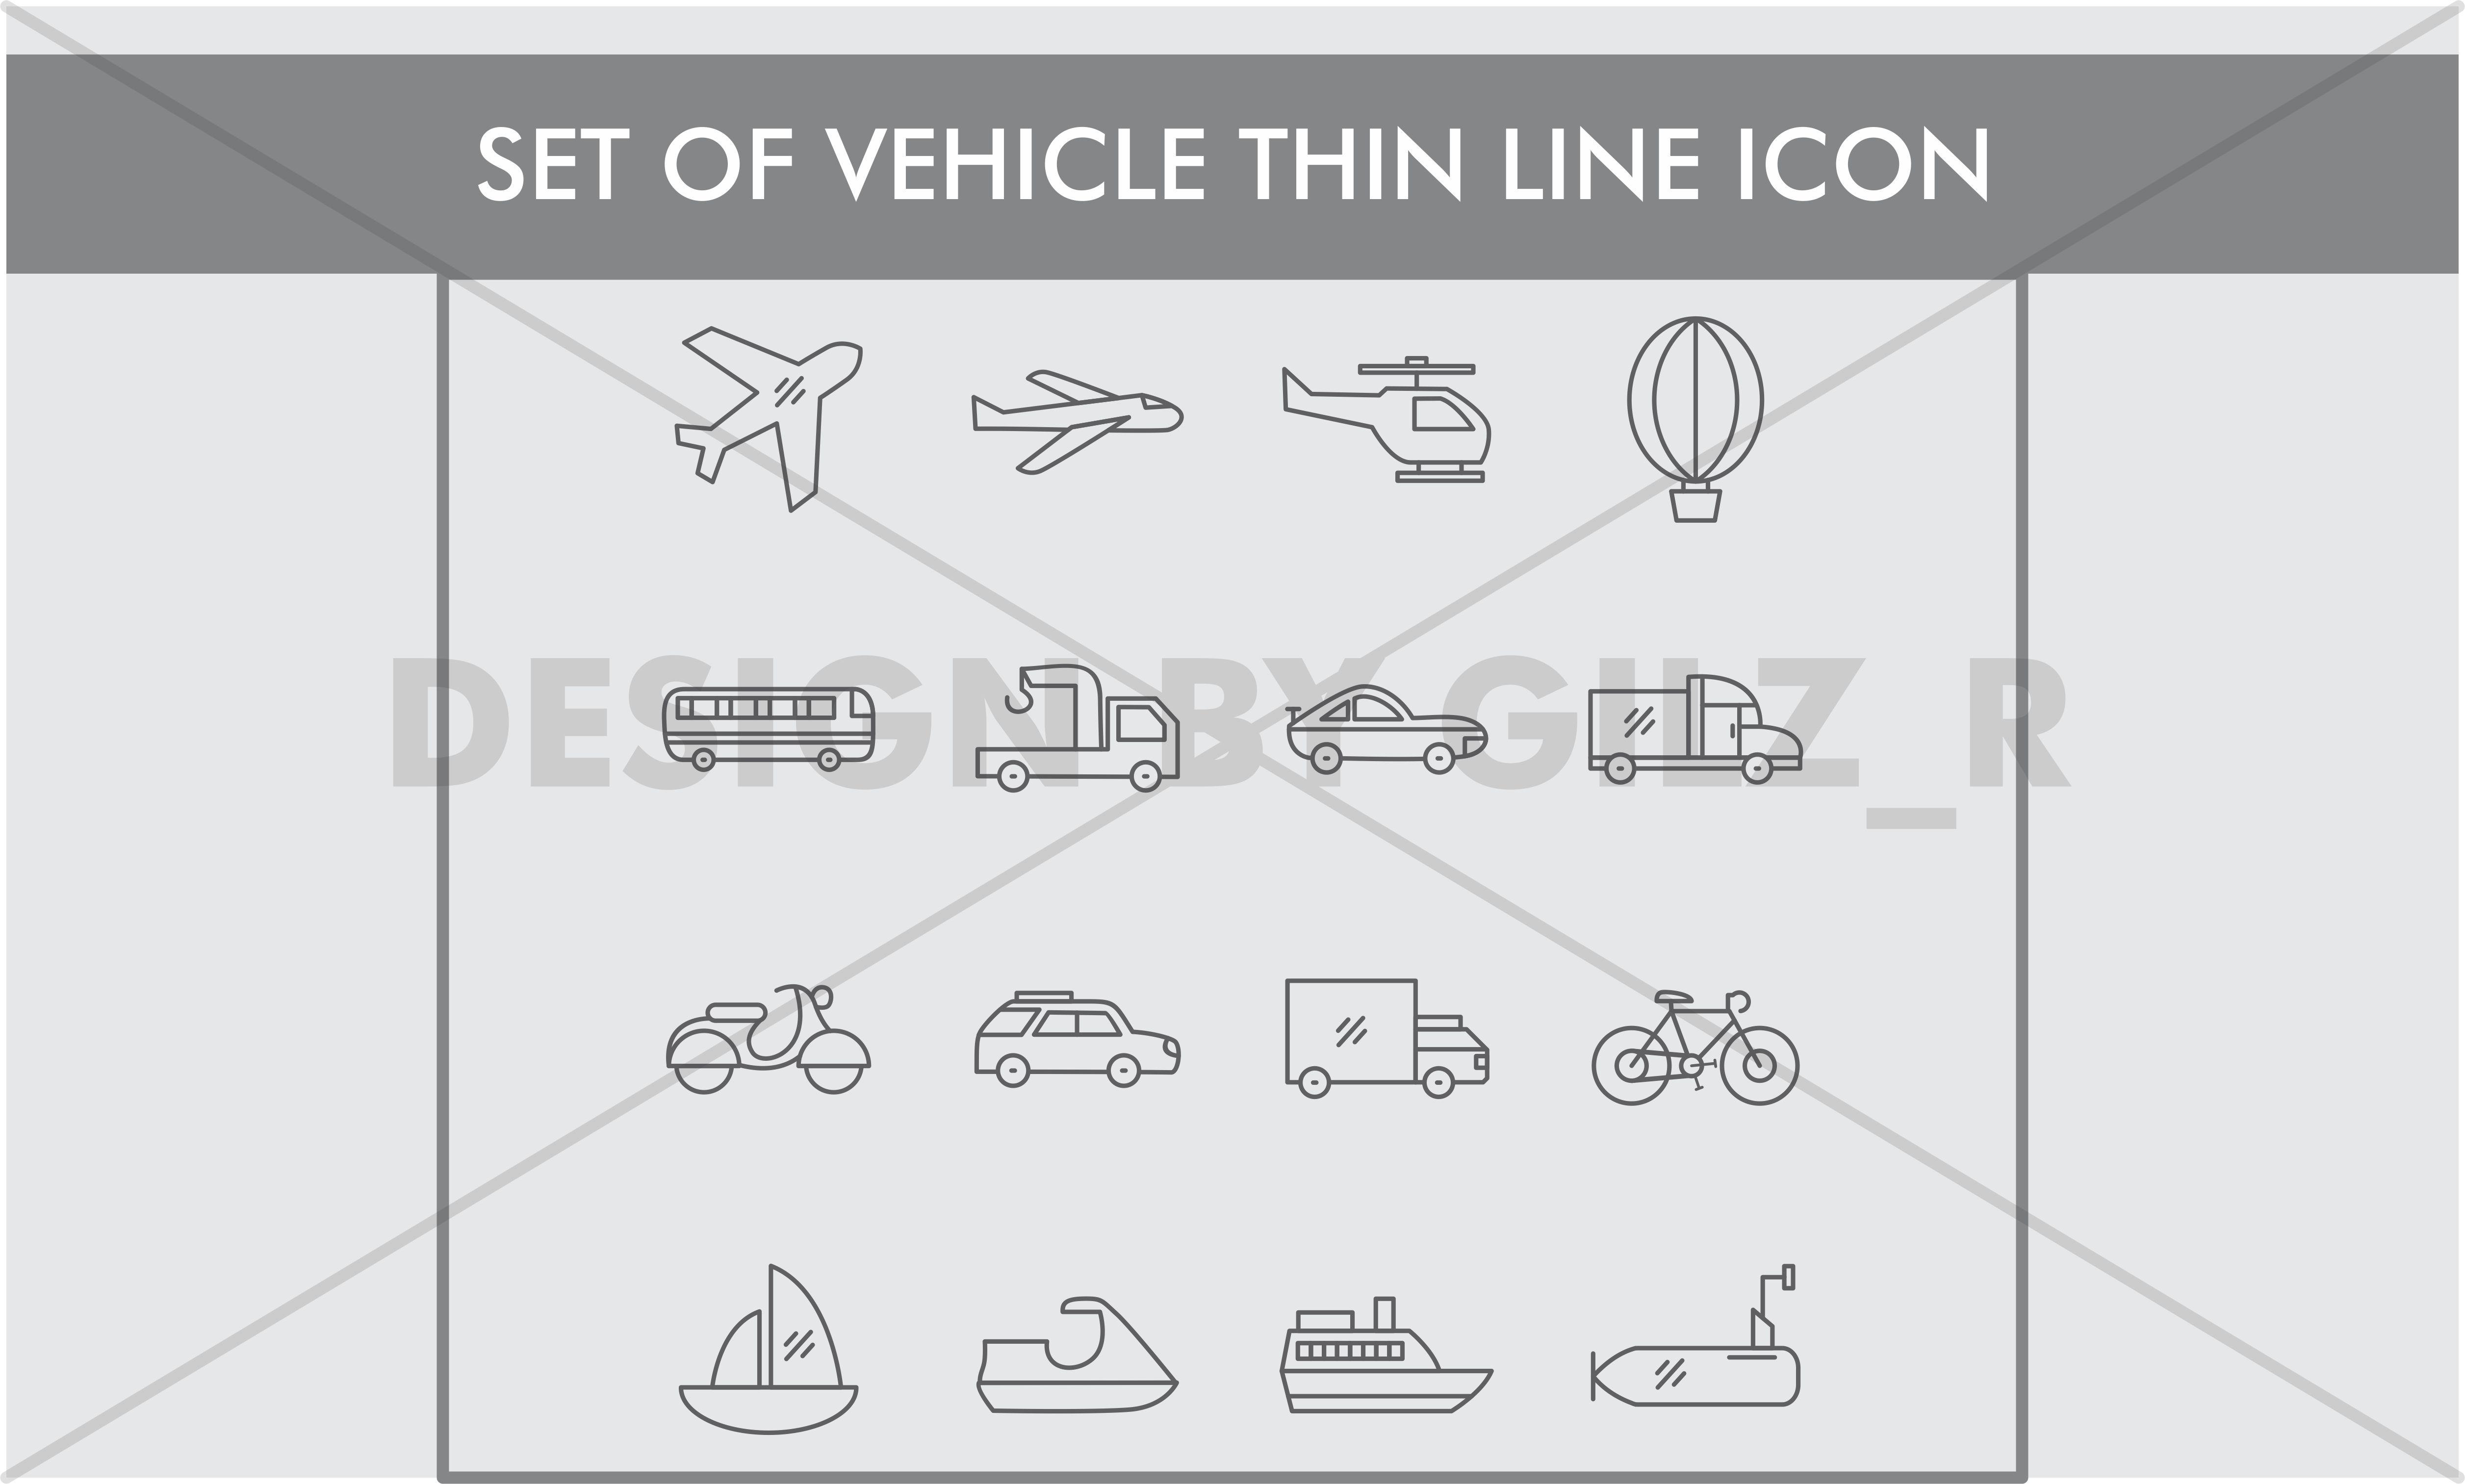 Set of Vehicle Thin Line Icons example image 1